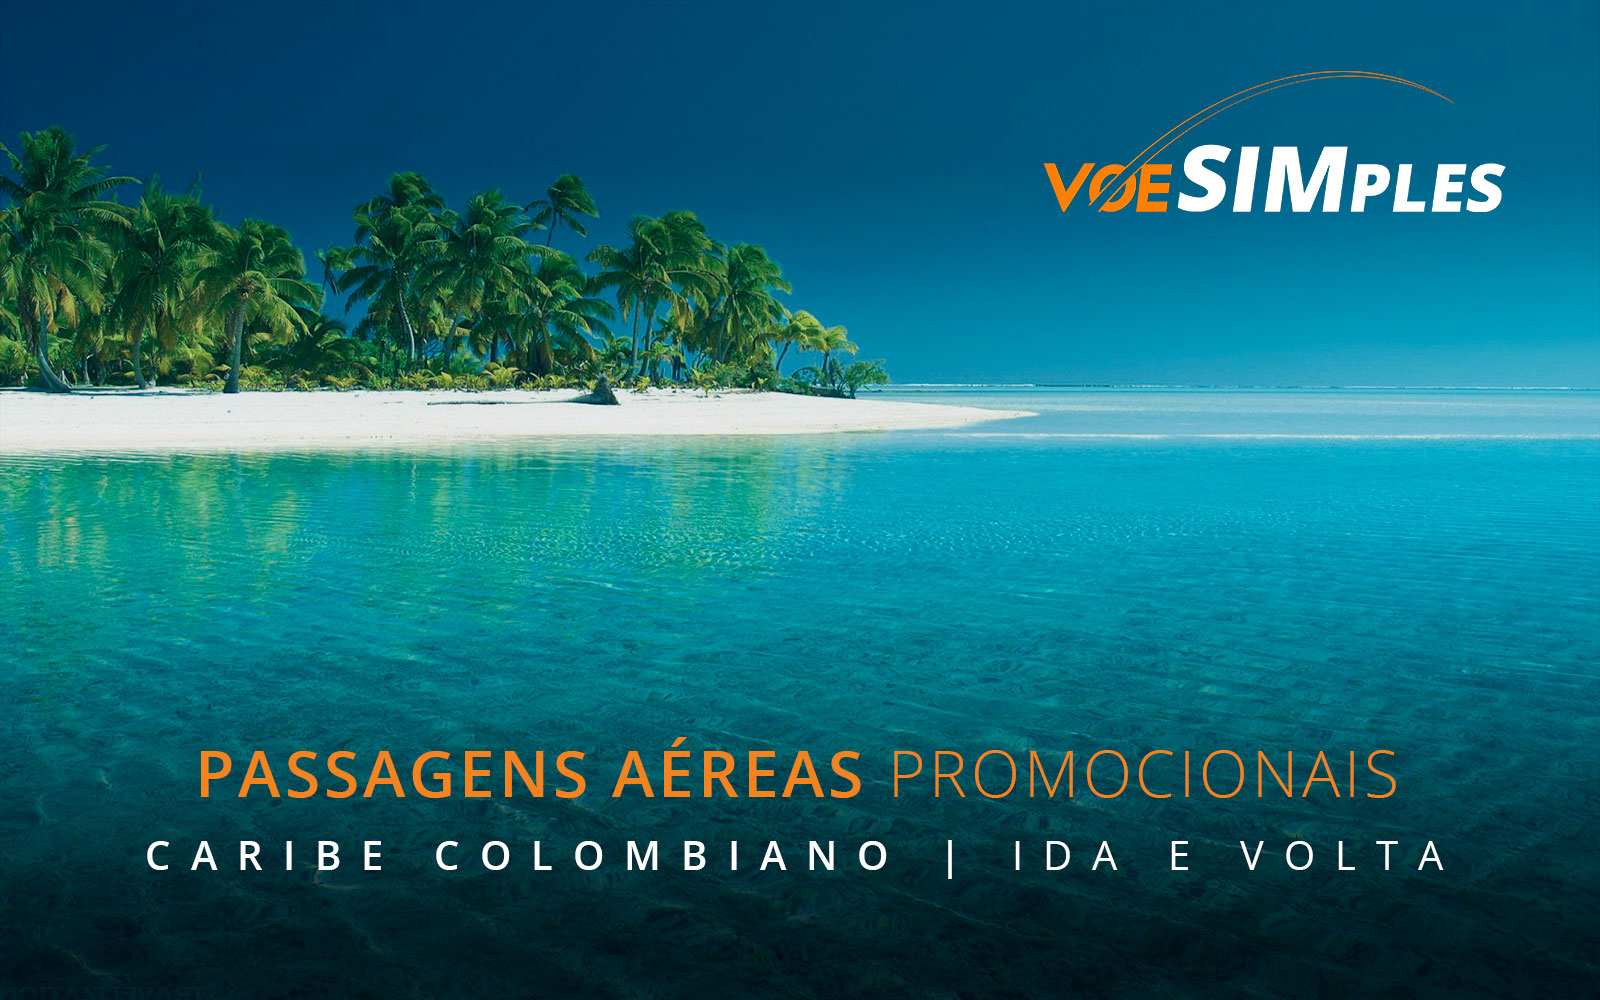 passagens-aereas-promocionais-colombia-caribe-voe-simples-passagens-aereas-baratas-promocao-caribe-colombiano